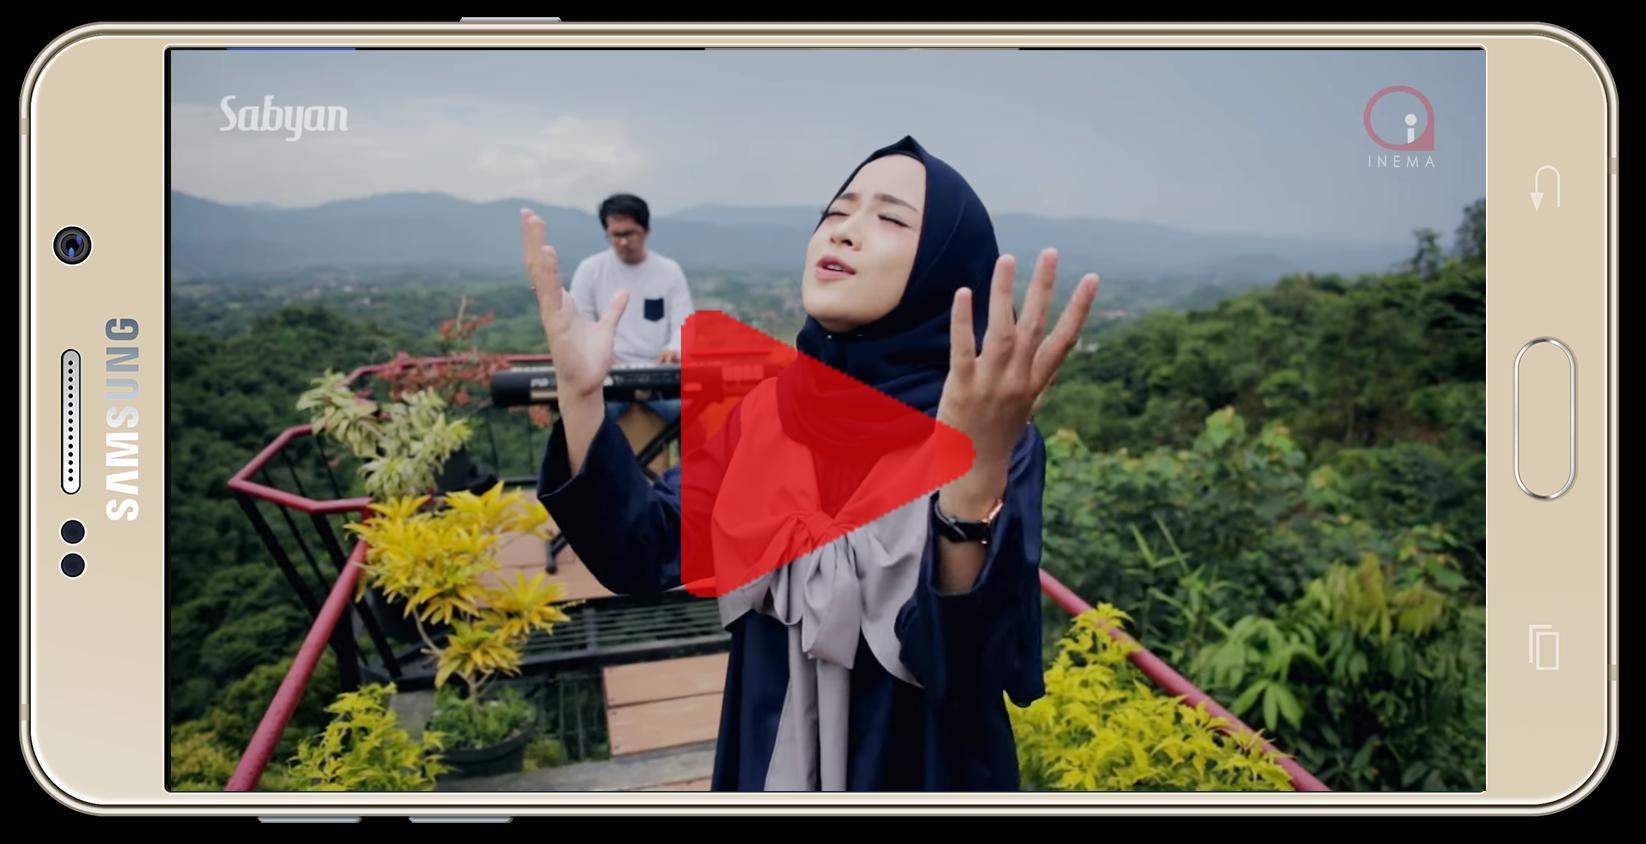 Sholawat Ya Asyiqol Versi Sabyan 2018 Video For Android Apk Download